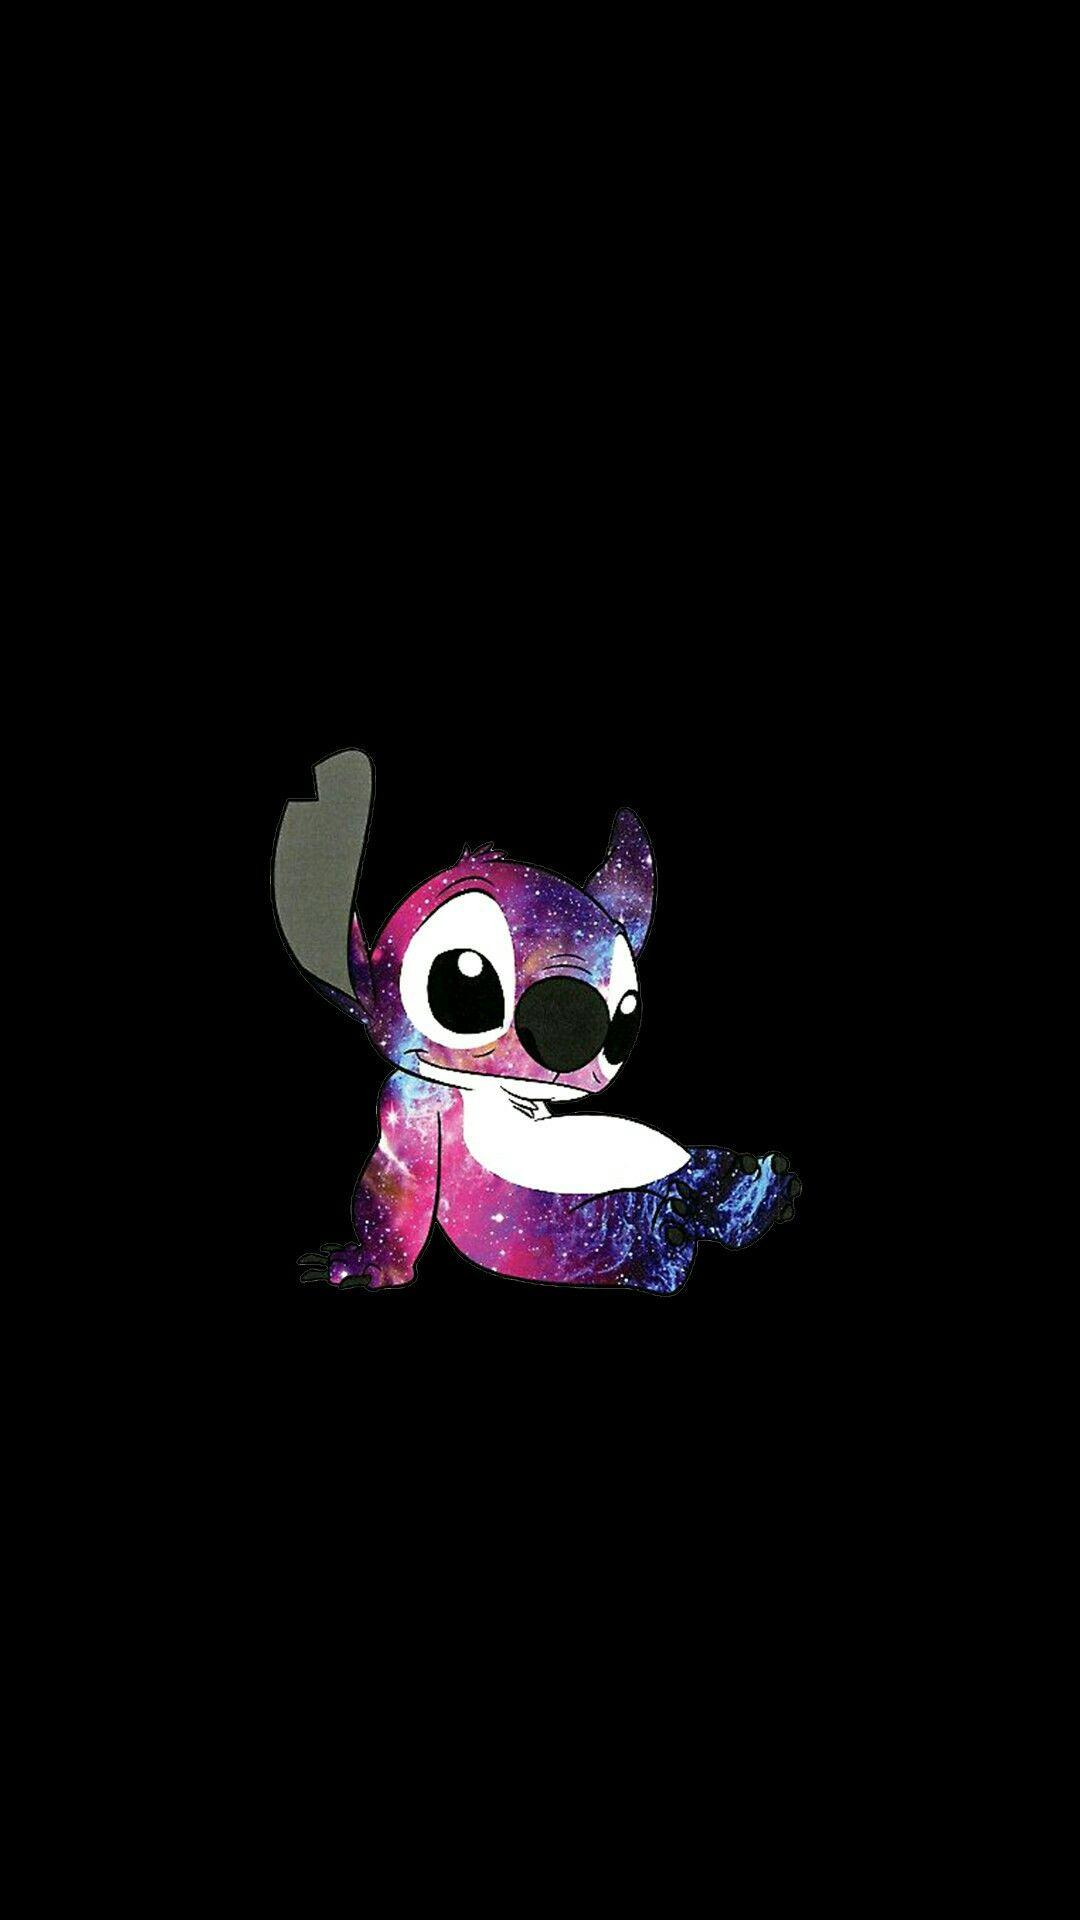 Stitch Iphone Wallpaper Fondo De Pantalla Animado Fondos De